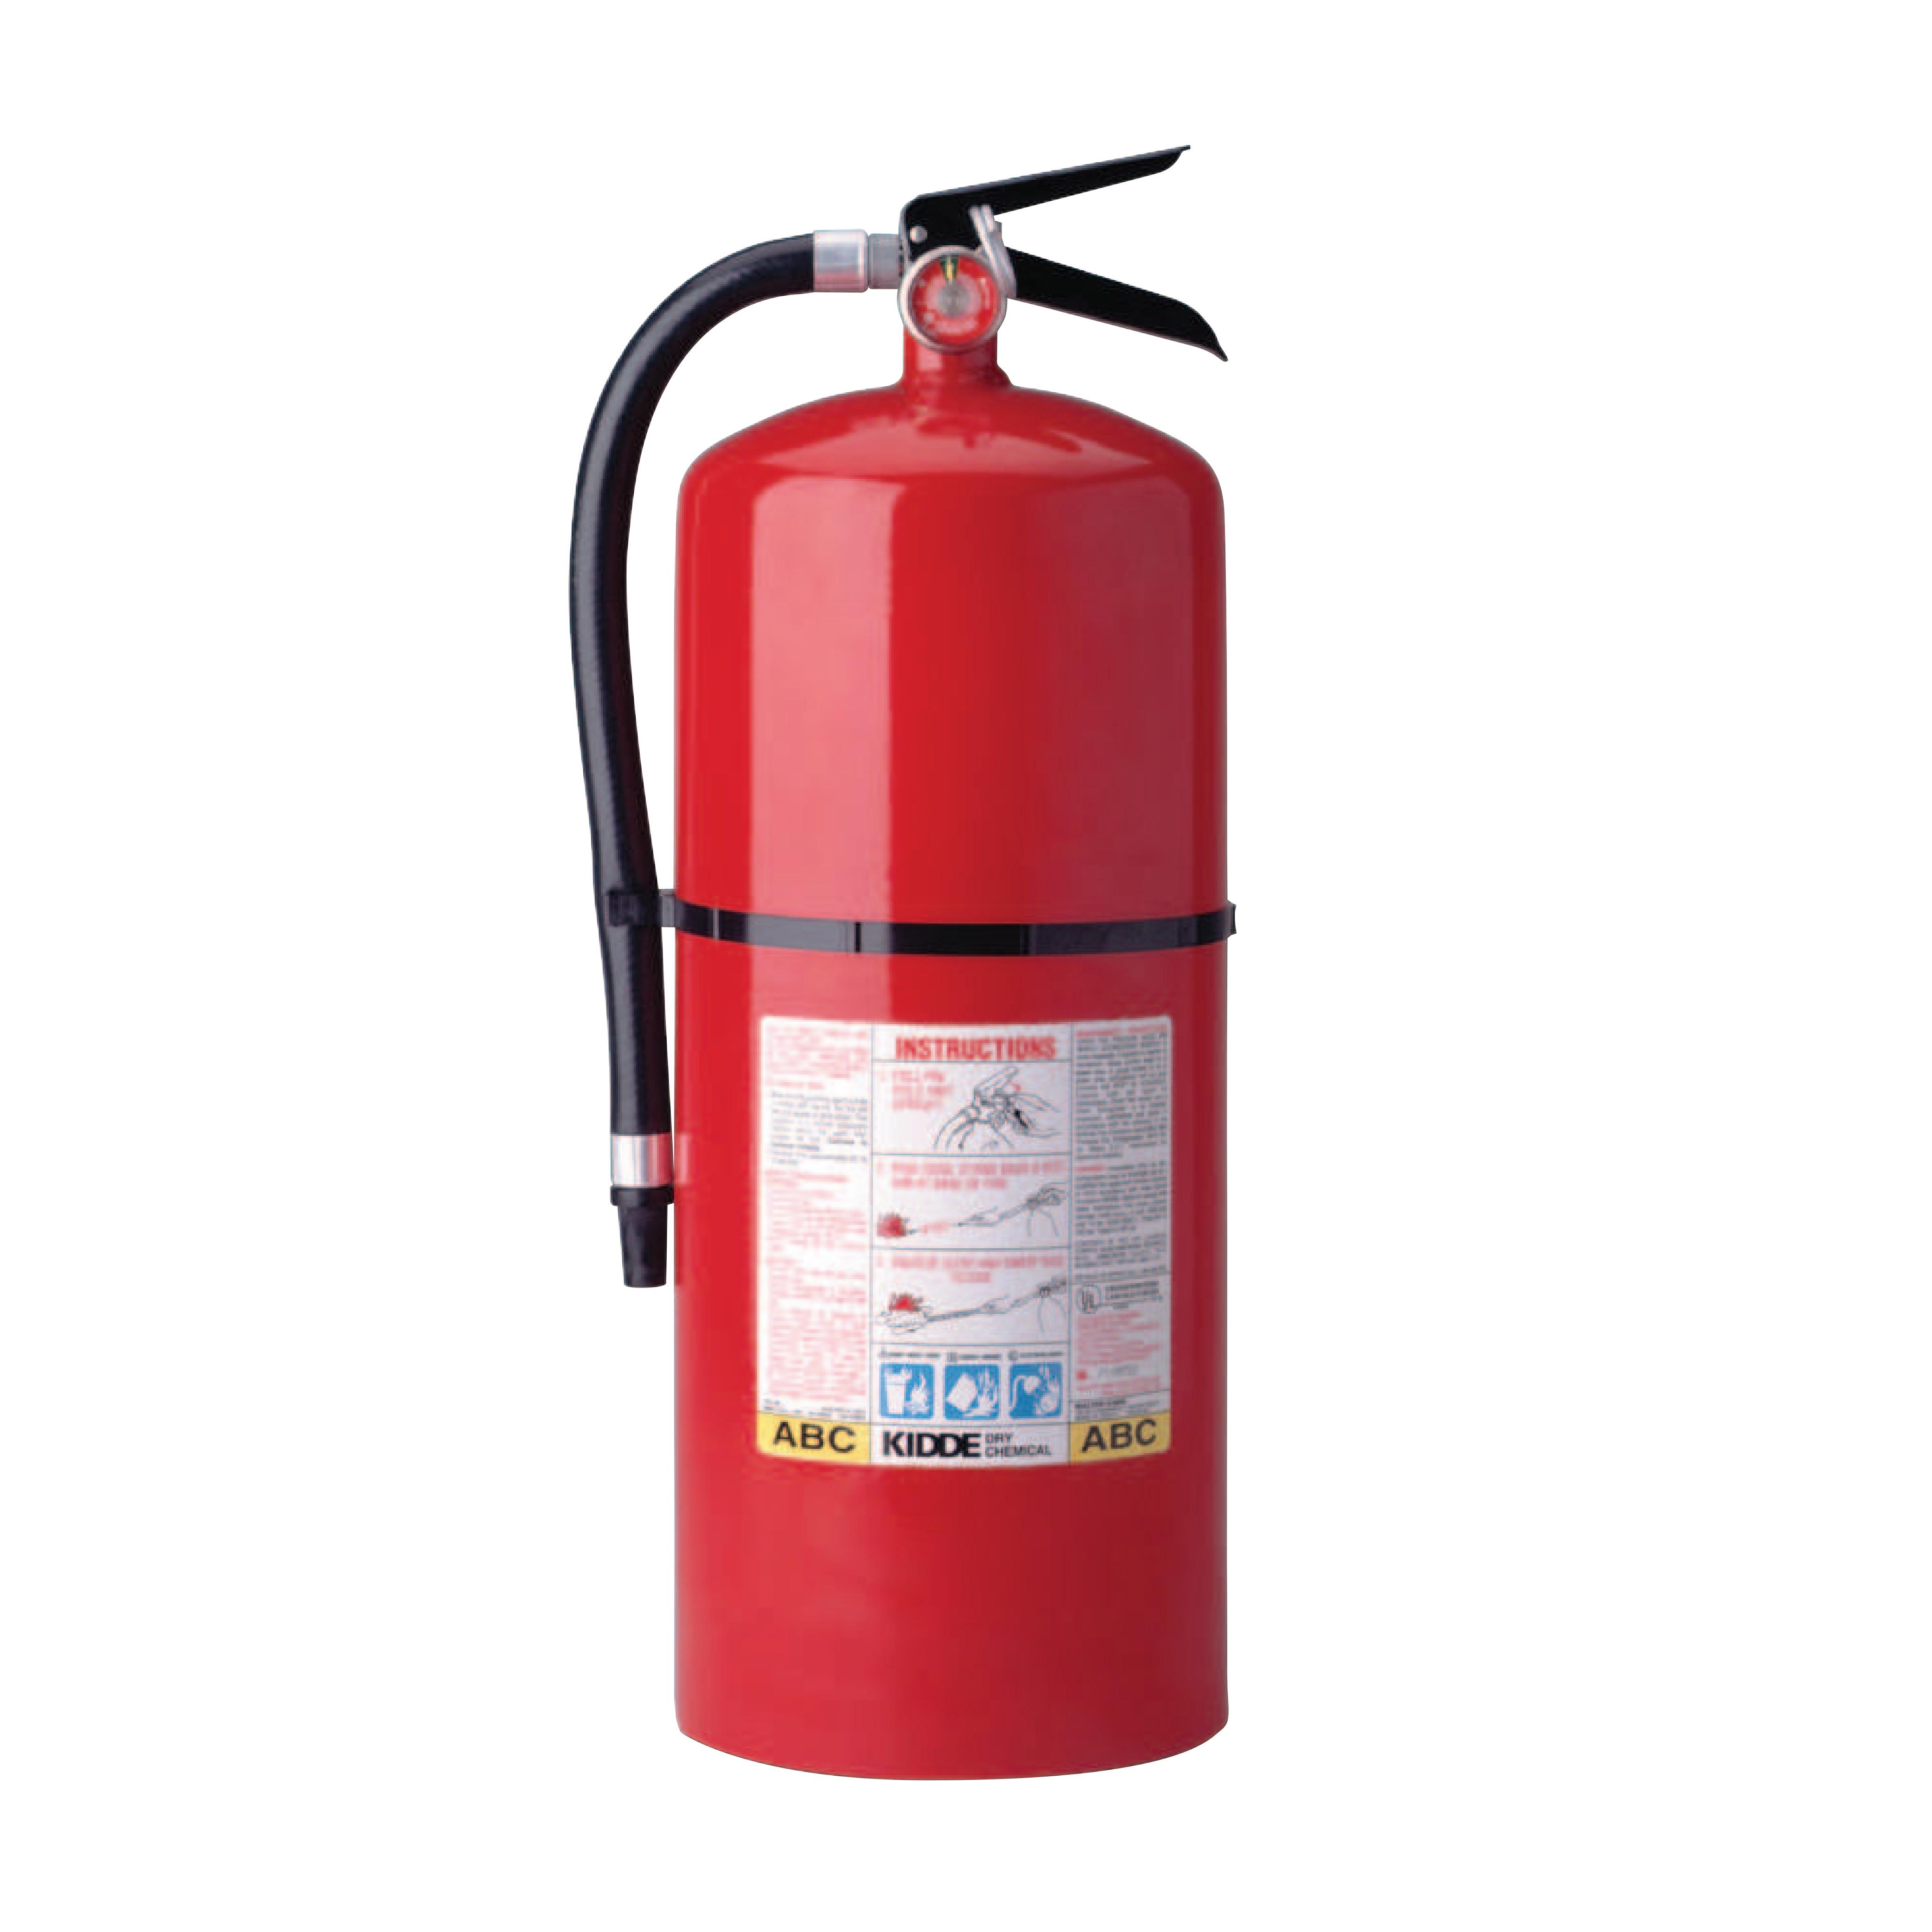 Kidde ProLine Multi-Purpose Dry Chemical Fire Extinguishers-ABC Type, 18 lb Cap. Wt.